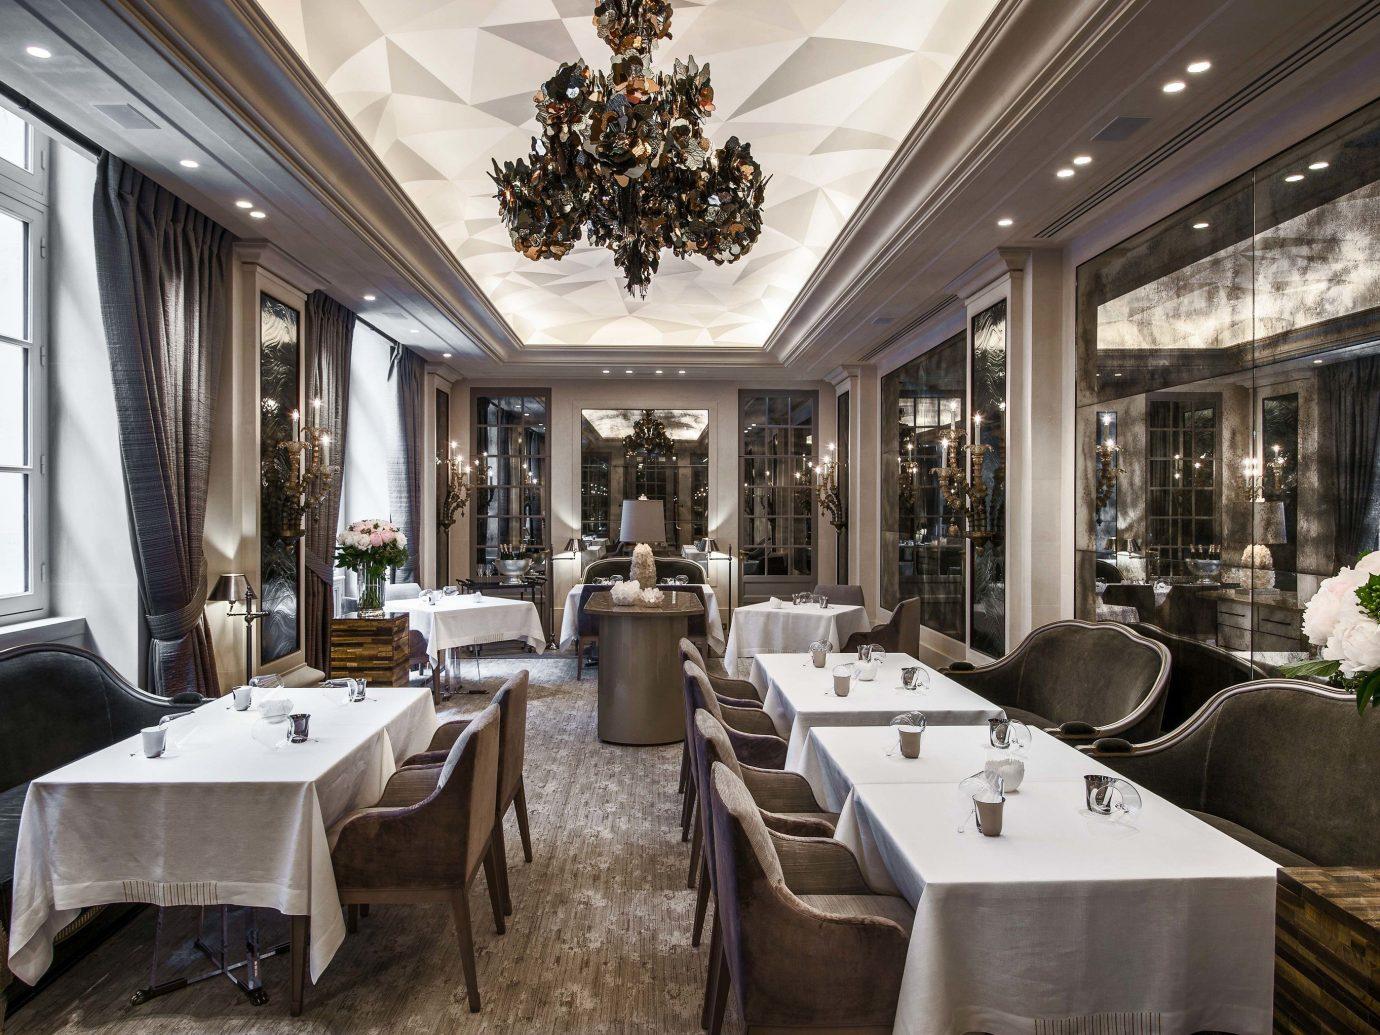 europe Trip Ideas indoor window room restaurant interior design ceiling furniture several dining room